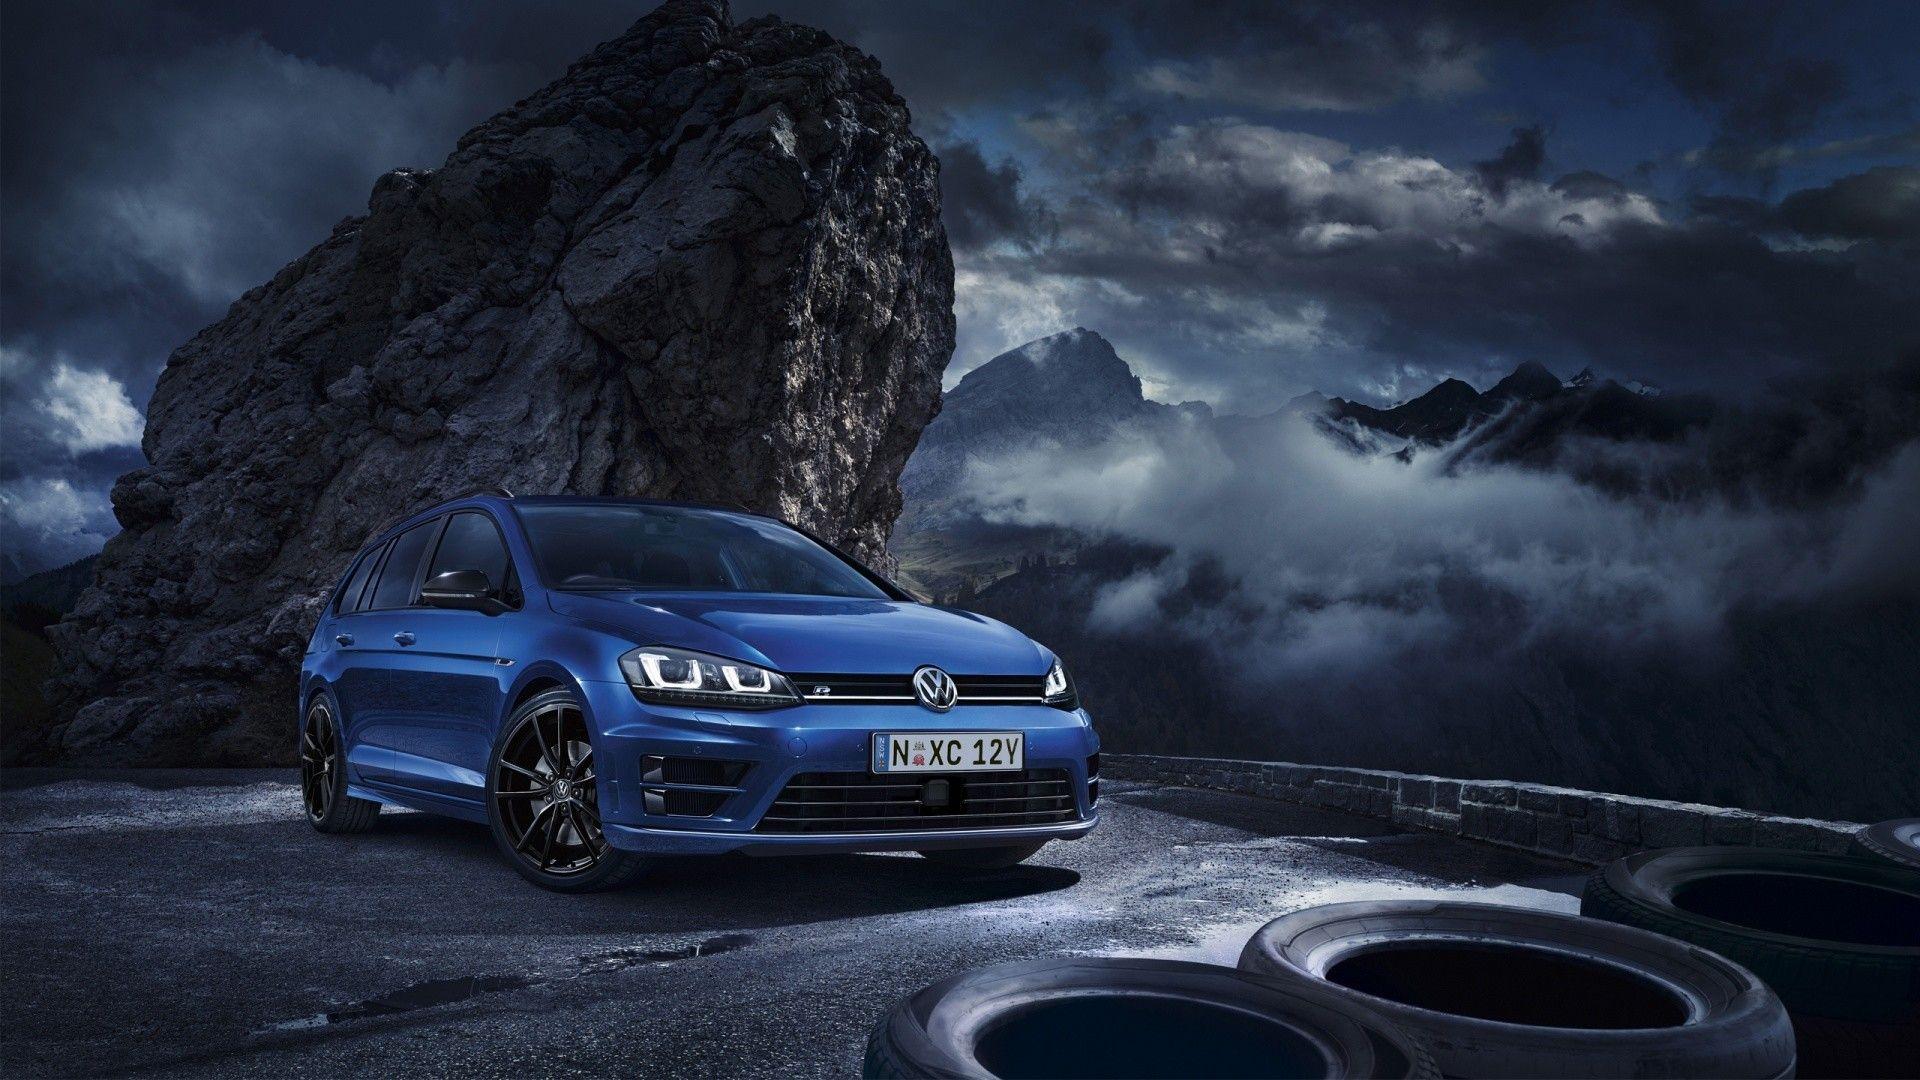 1920x1080 X 1080 2560 X 1440 Original Wallpaper 2015 Volkswagen Golf R Wagon Volkswagen Volkswagen Scirocco Car Volkswagen